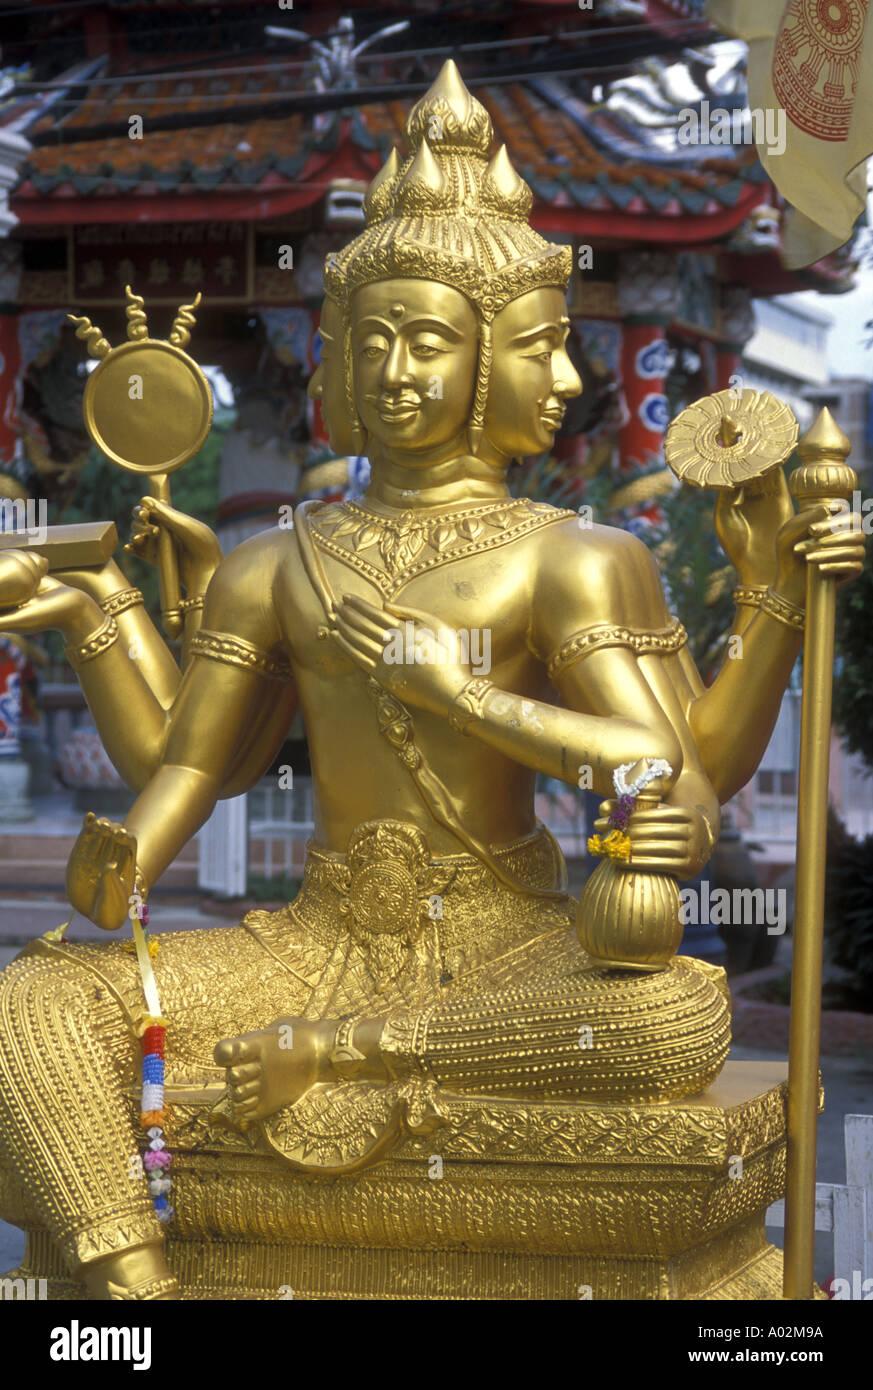 d98ef3390636e Hinduism a trimurti statue representing the gods Brahma Shiva and Vishnu -  Stock Image